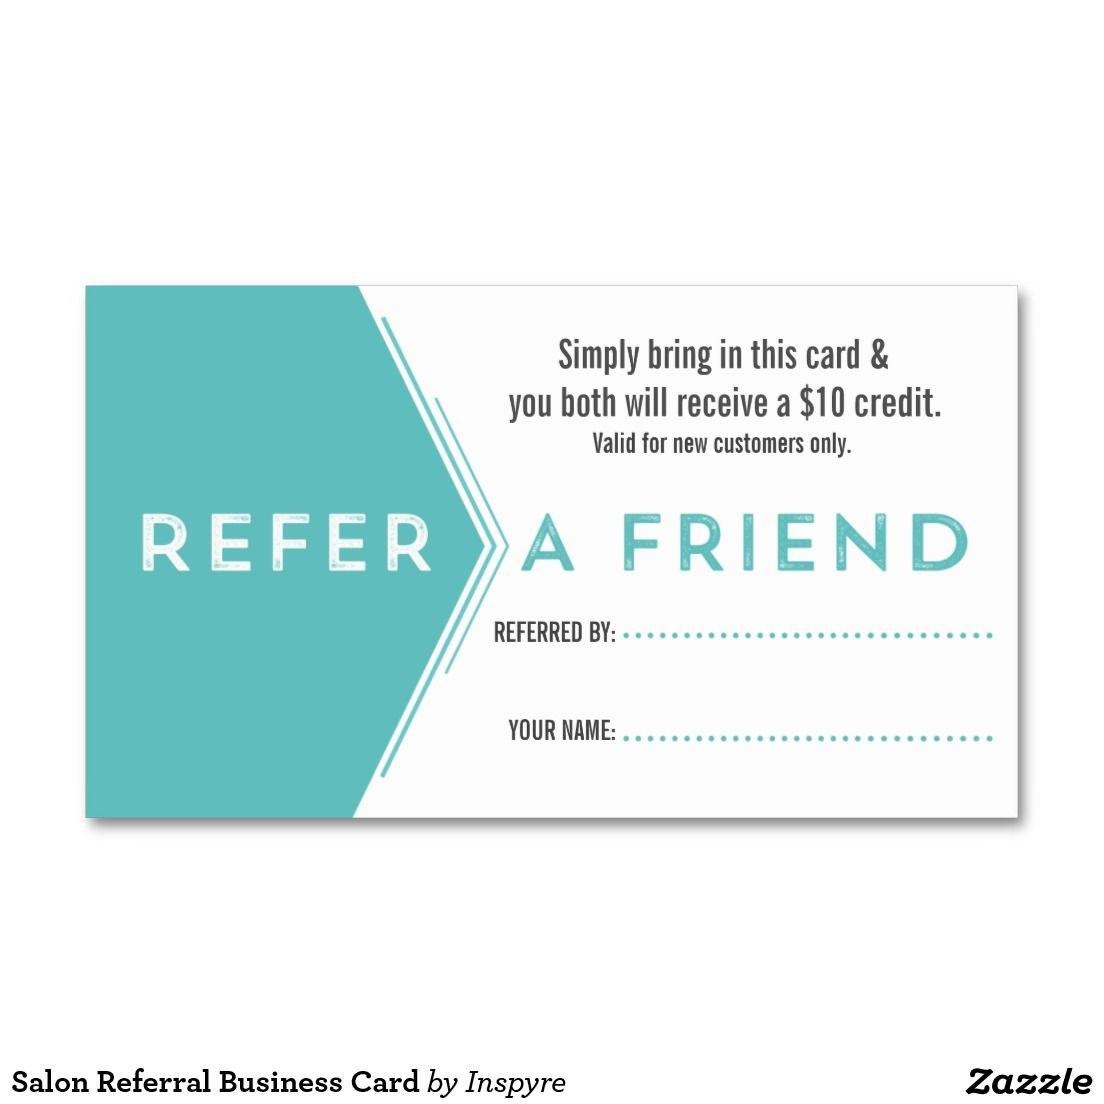 Salon Referral Business Card  Zazzle  Customer Loyalty In Referral Card Template